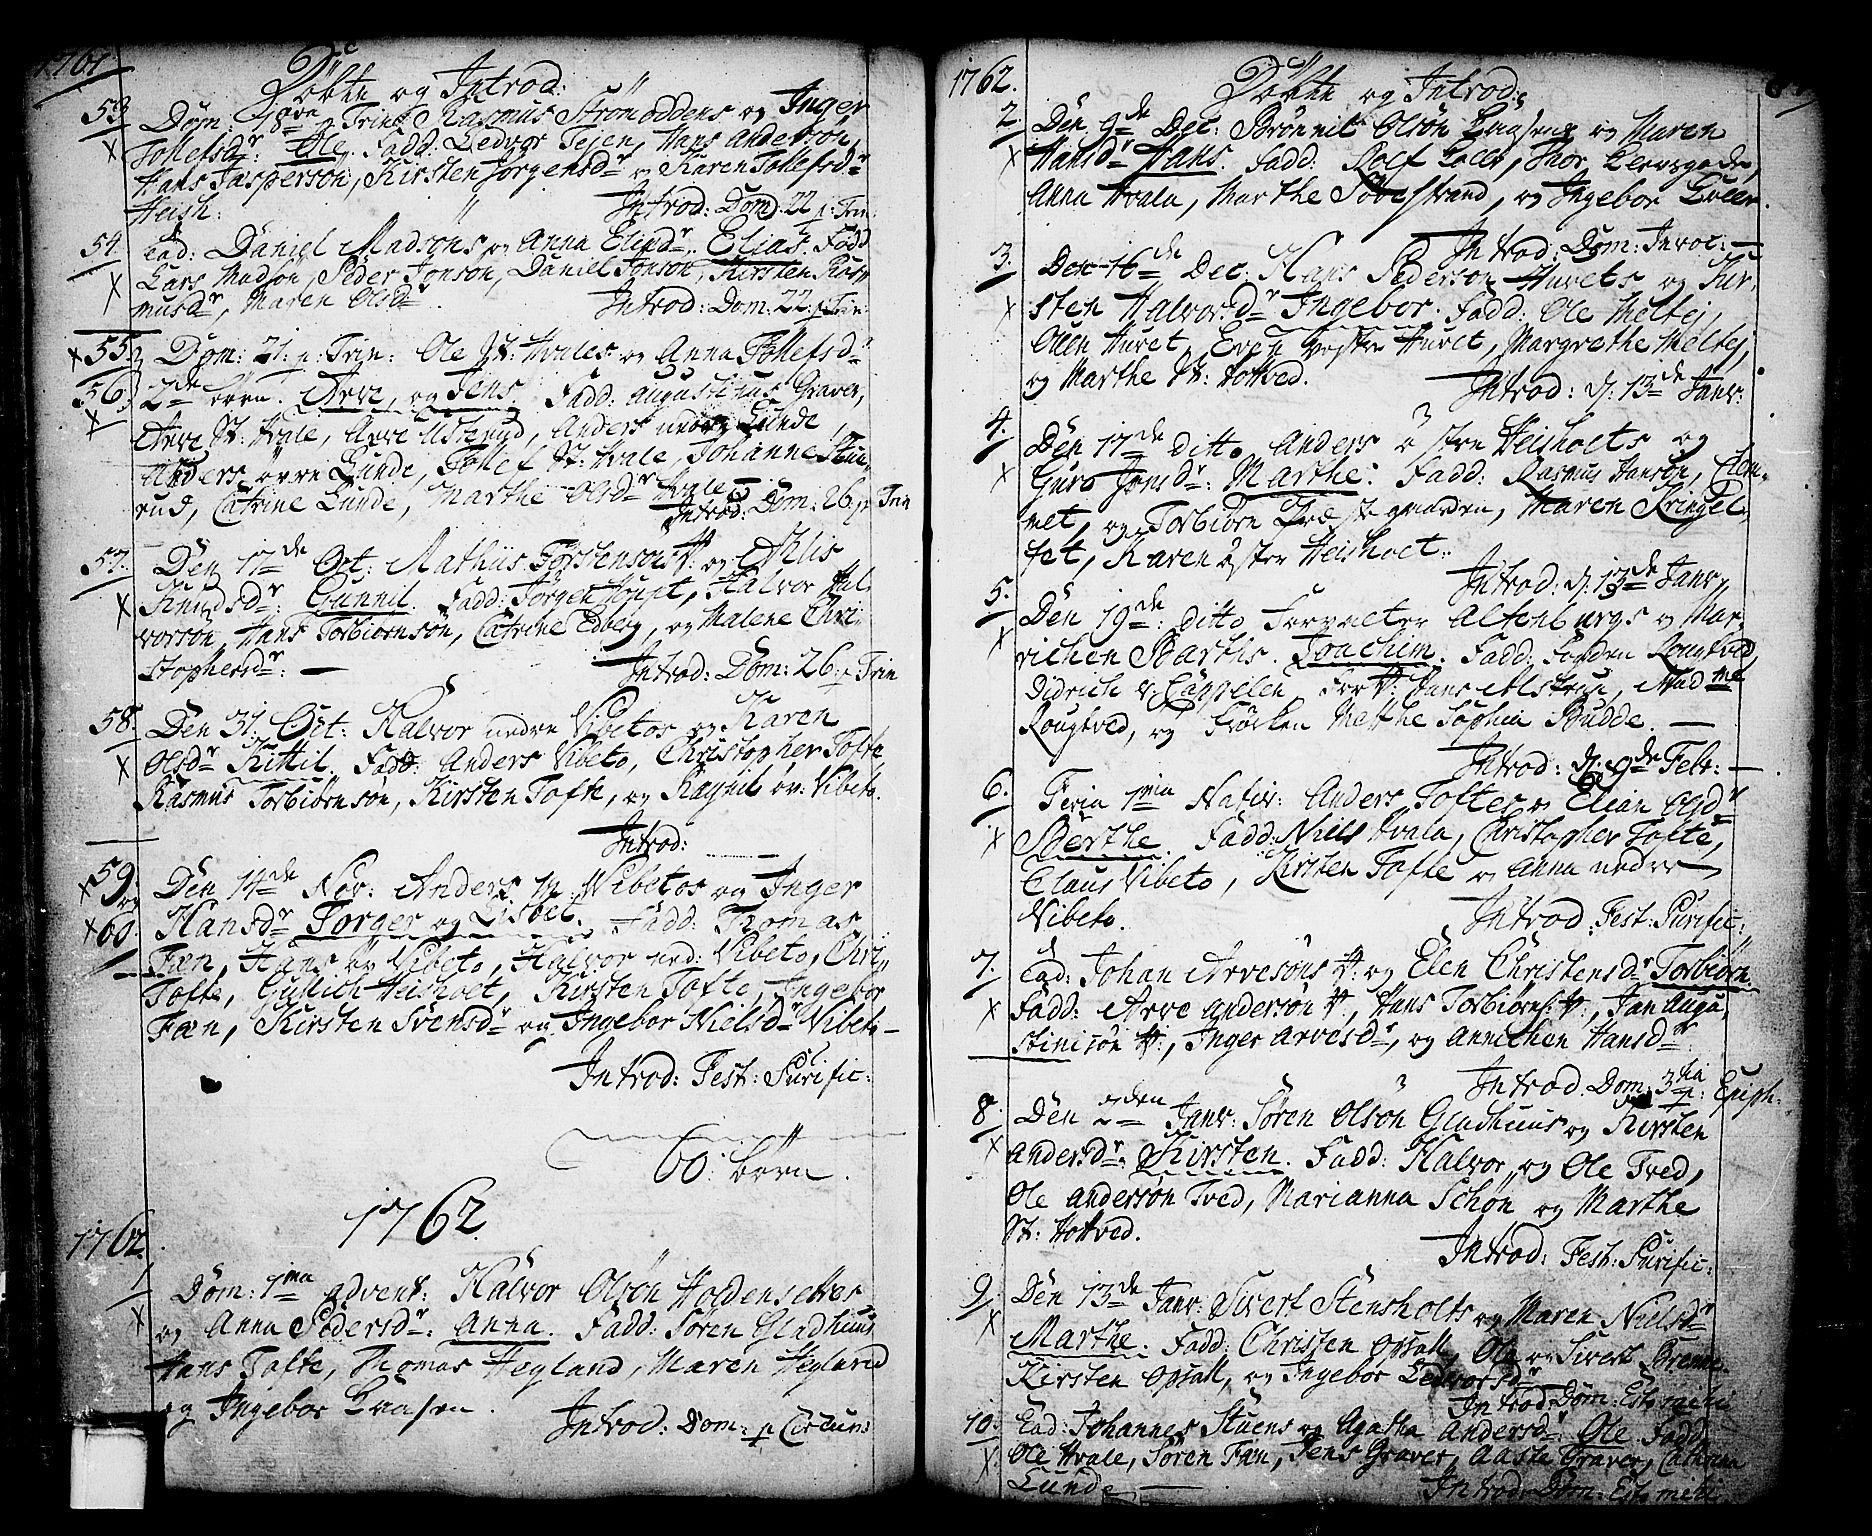 SAKO, Holla kirkebøker, F/Fa/L0001: Ministerialbok nr. 1, 1717-1779, s. 87